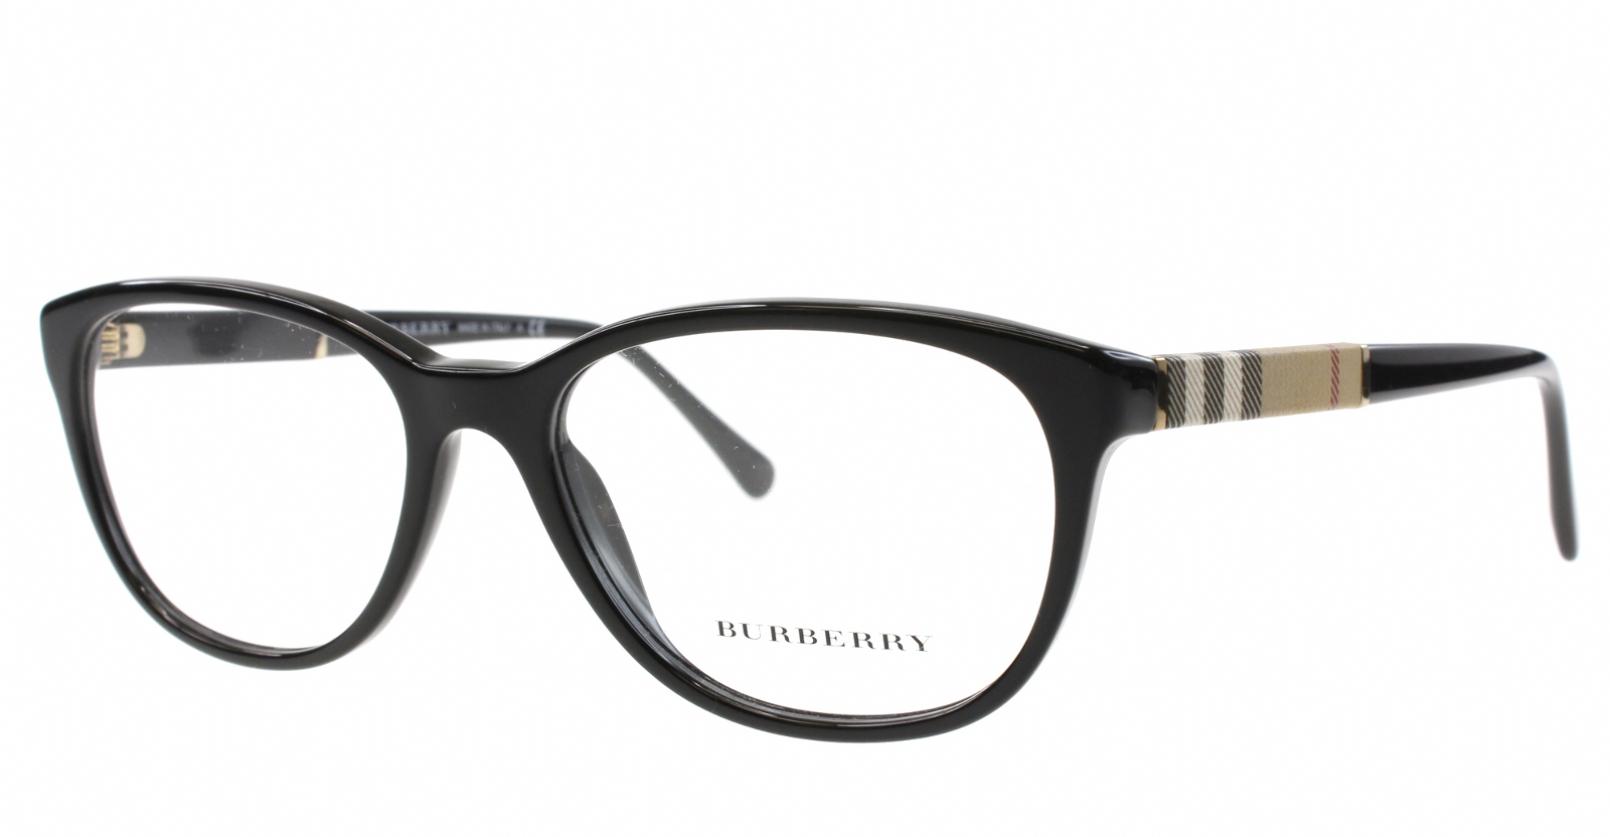 3fae7114c5e2 Buy Burberry Eyeglasses directly from OpticsFast.com